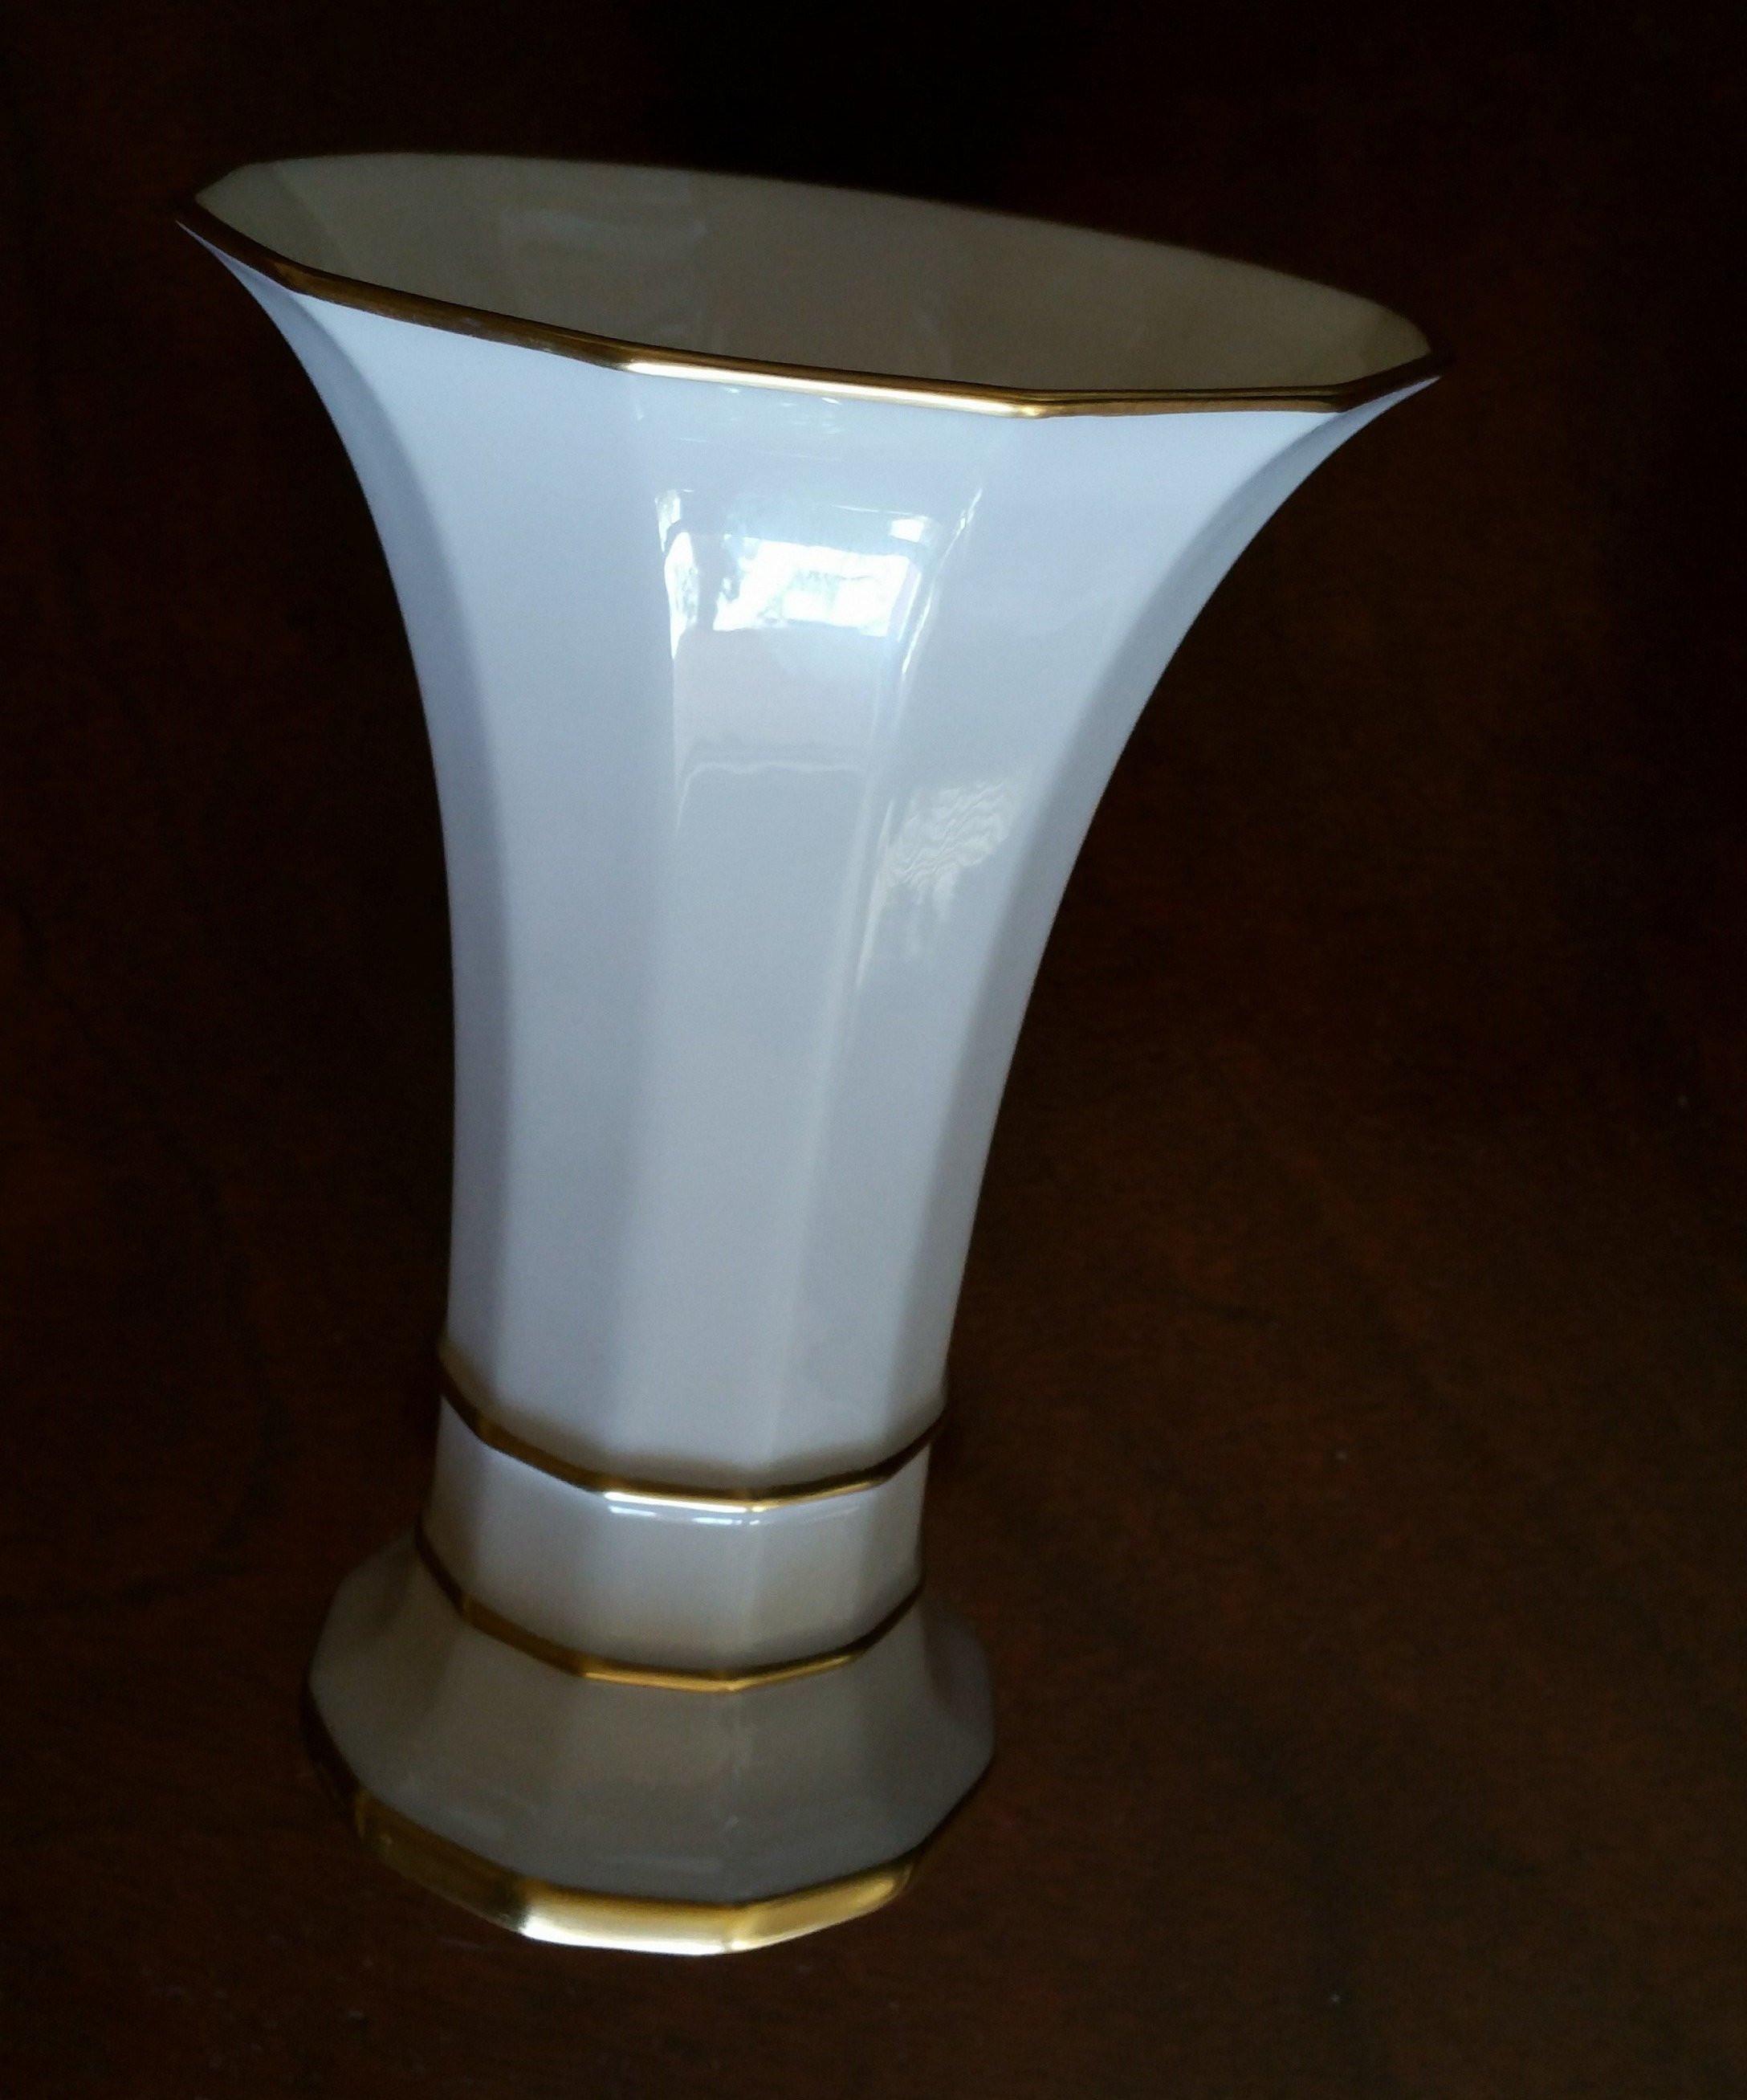 lenox rose vase gold trim of lenox porcelain vase in white gold r86 trim green mark etsy pertaining to image 0 image 1